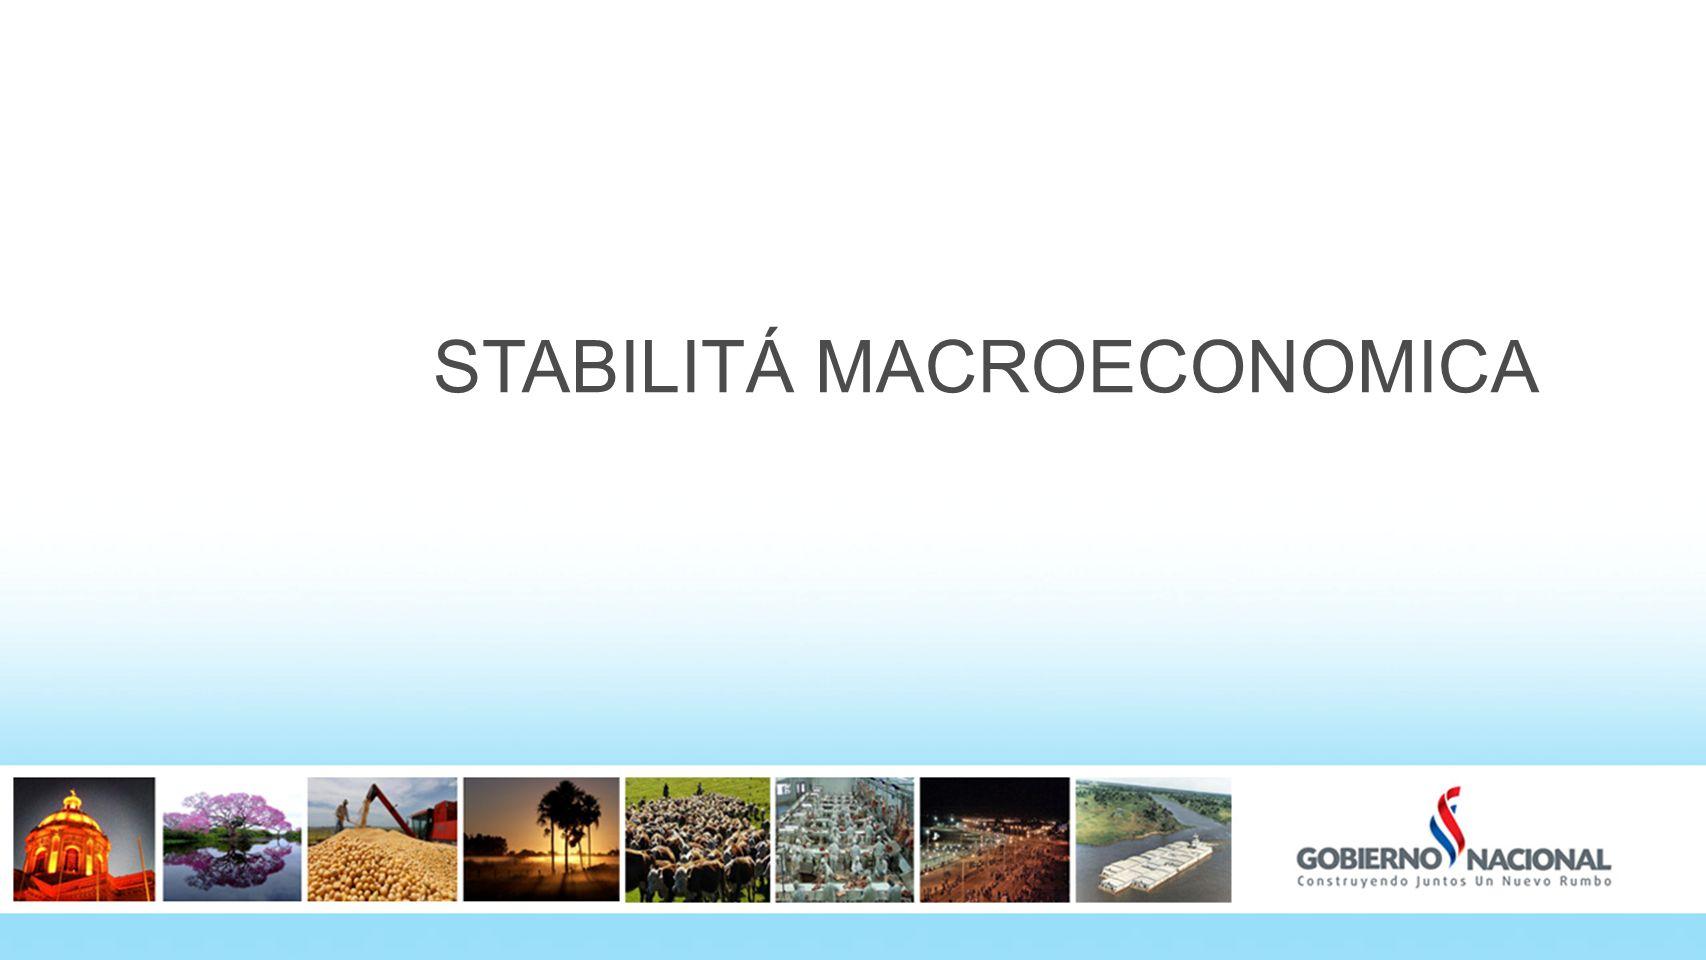 STABILITÁ MACROECONOMICA